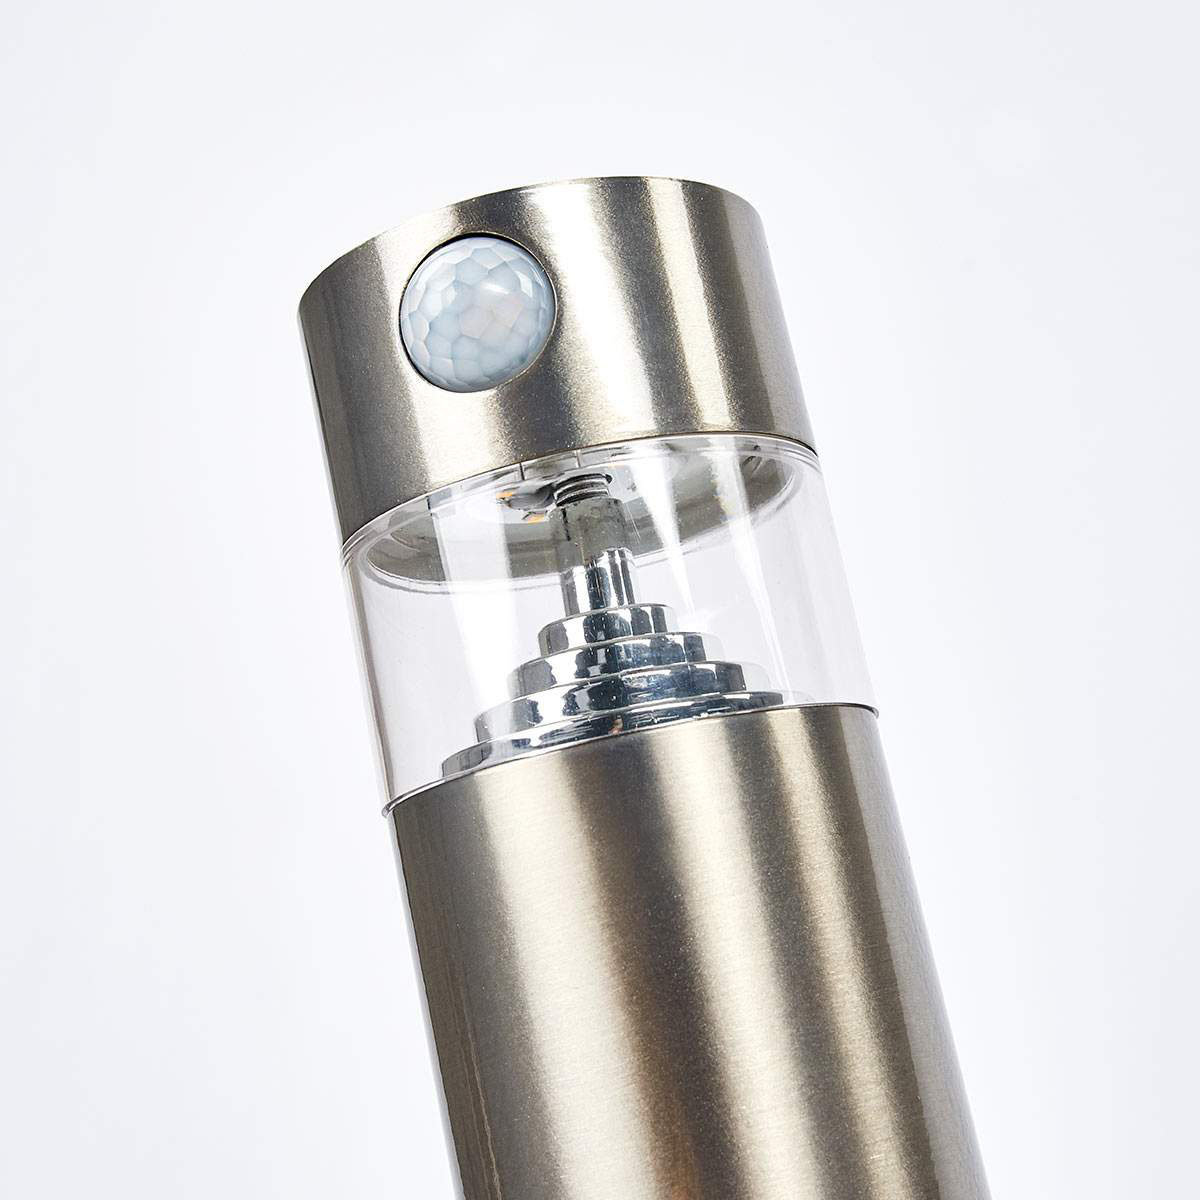 Solar-LED-Sockelleuchte Kalypso mit Bewegungsmelder, 50x7,8x7,8 cm, Edelstahl, silber | #6